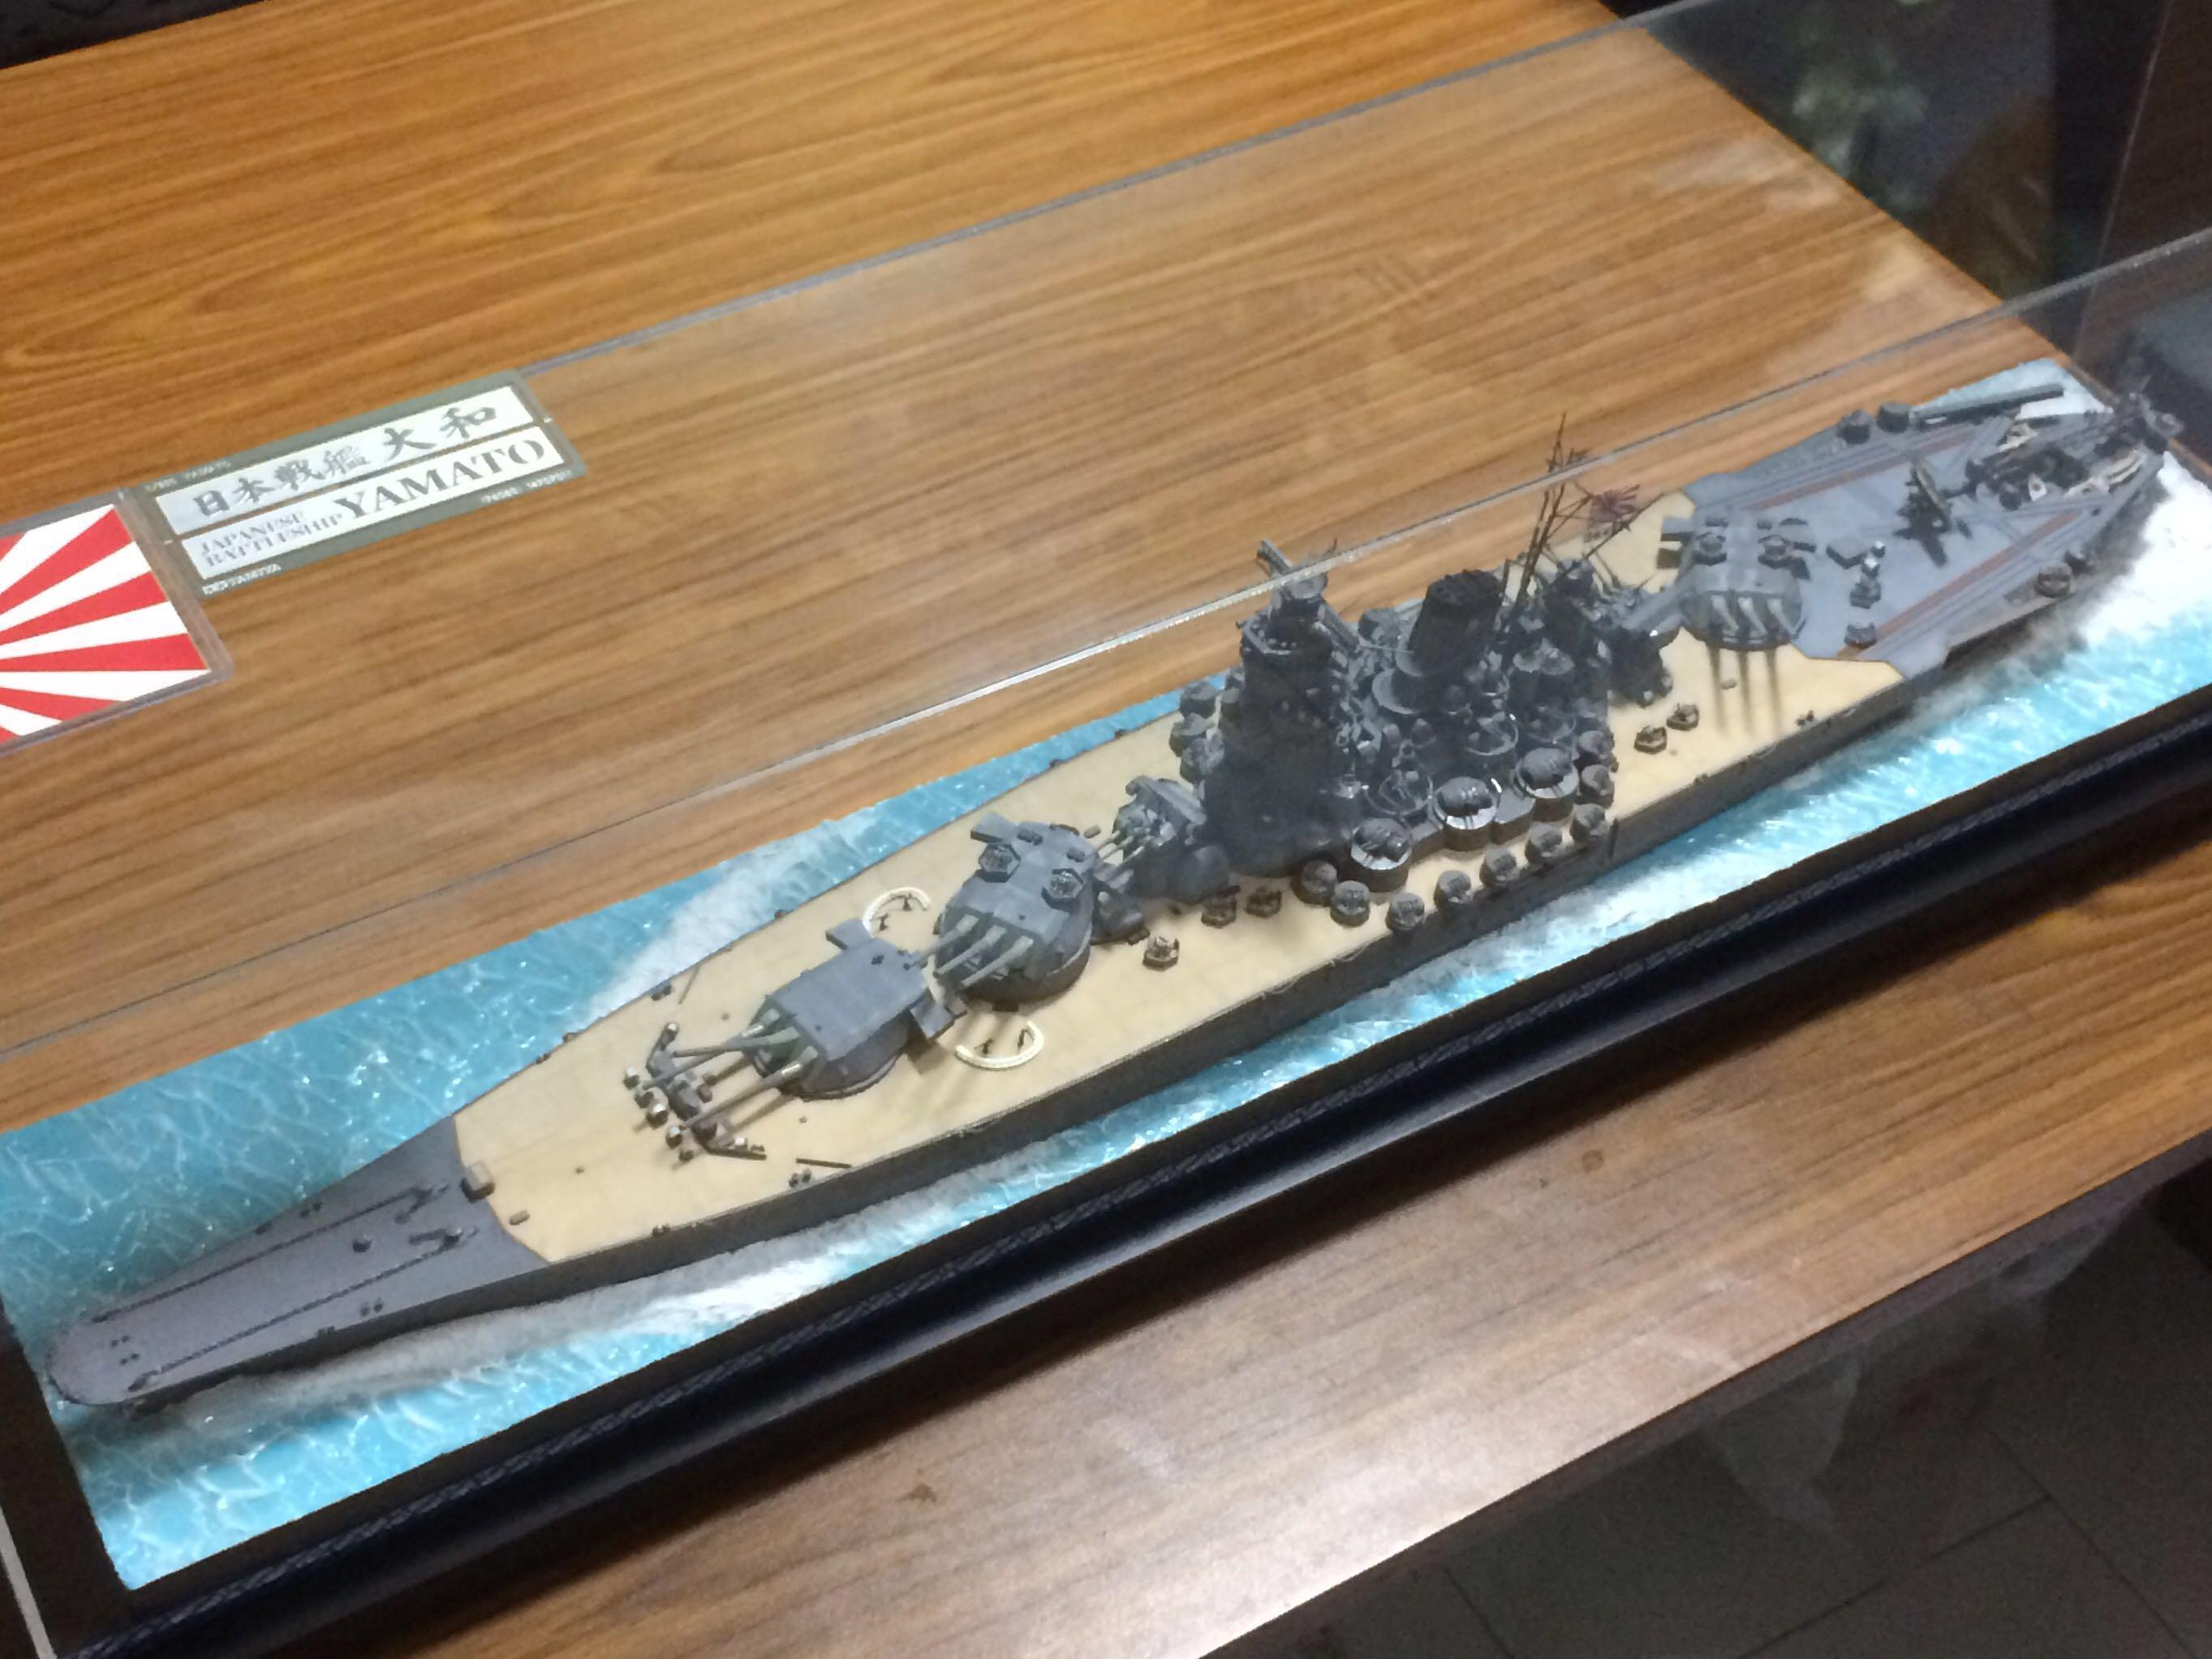 Battleship Yamato 1:350 scale premium edition built model